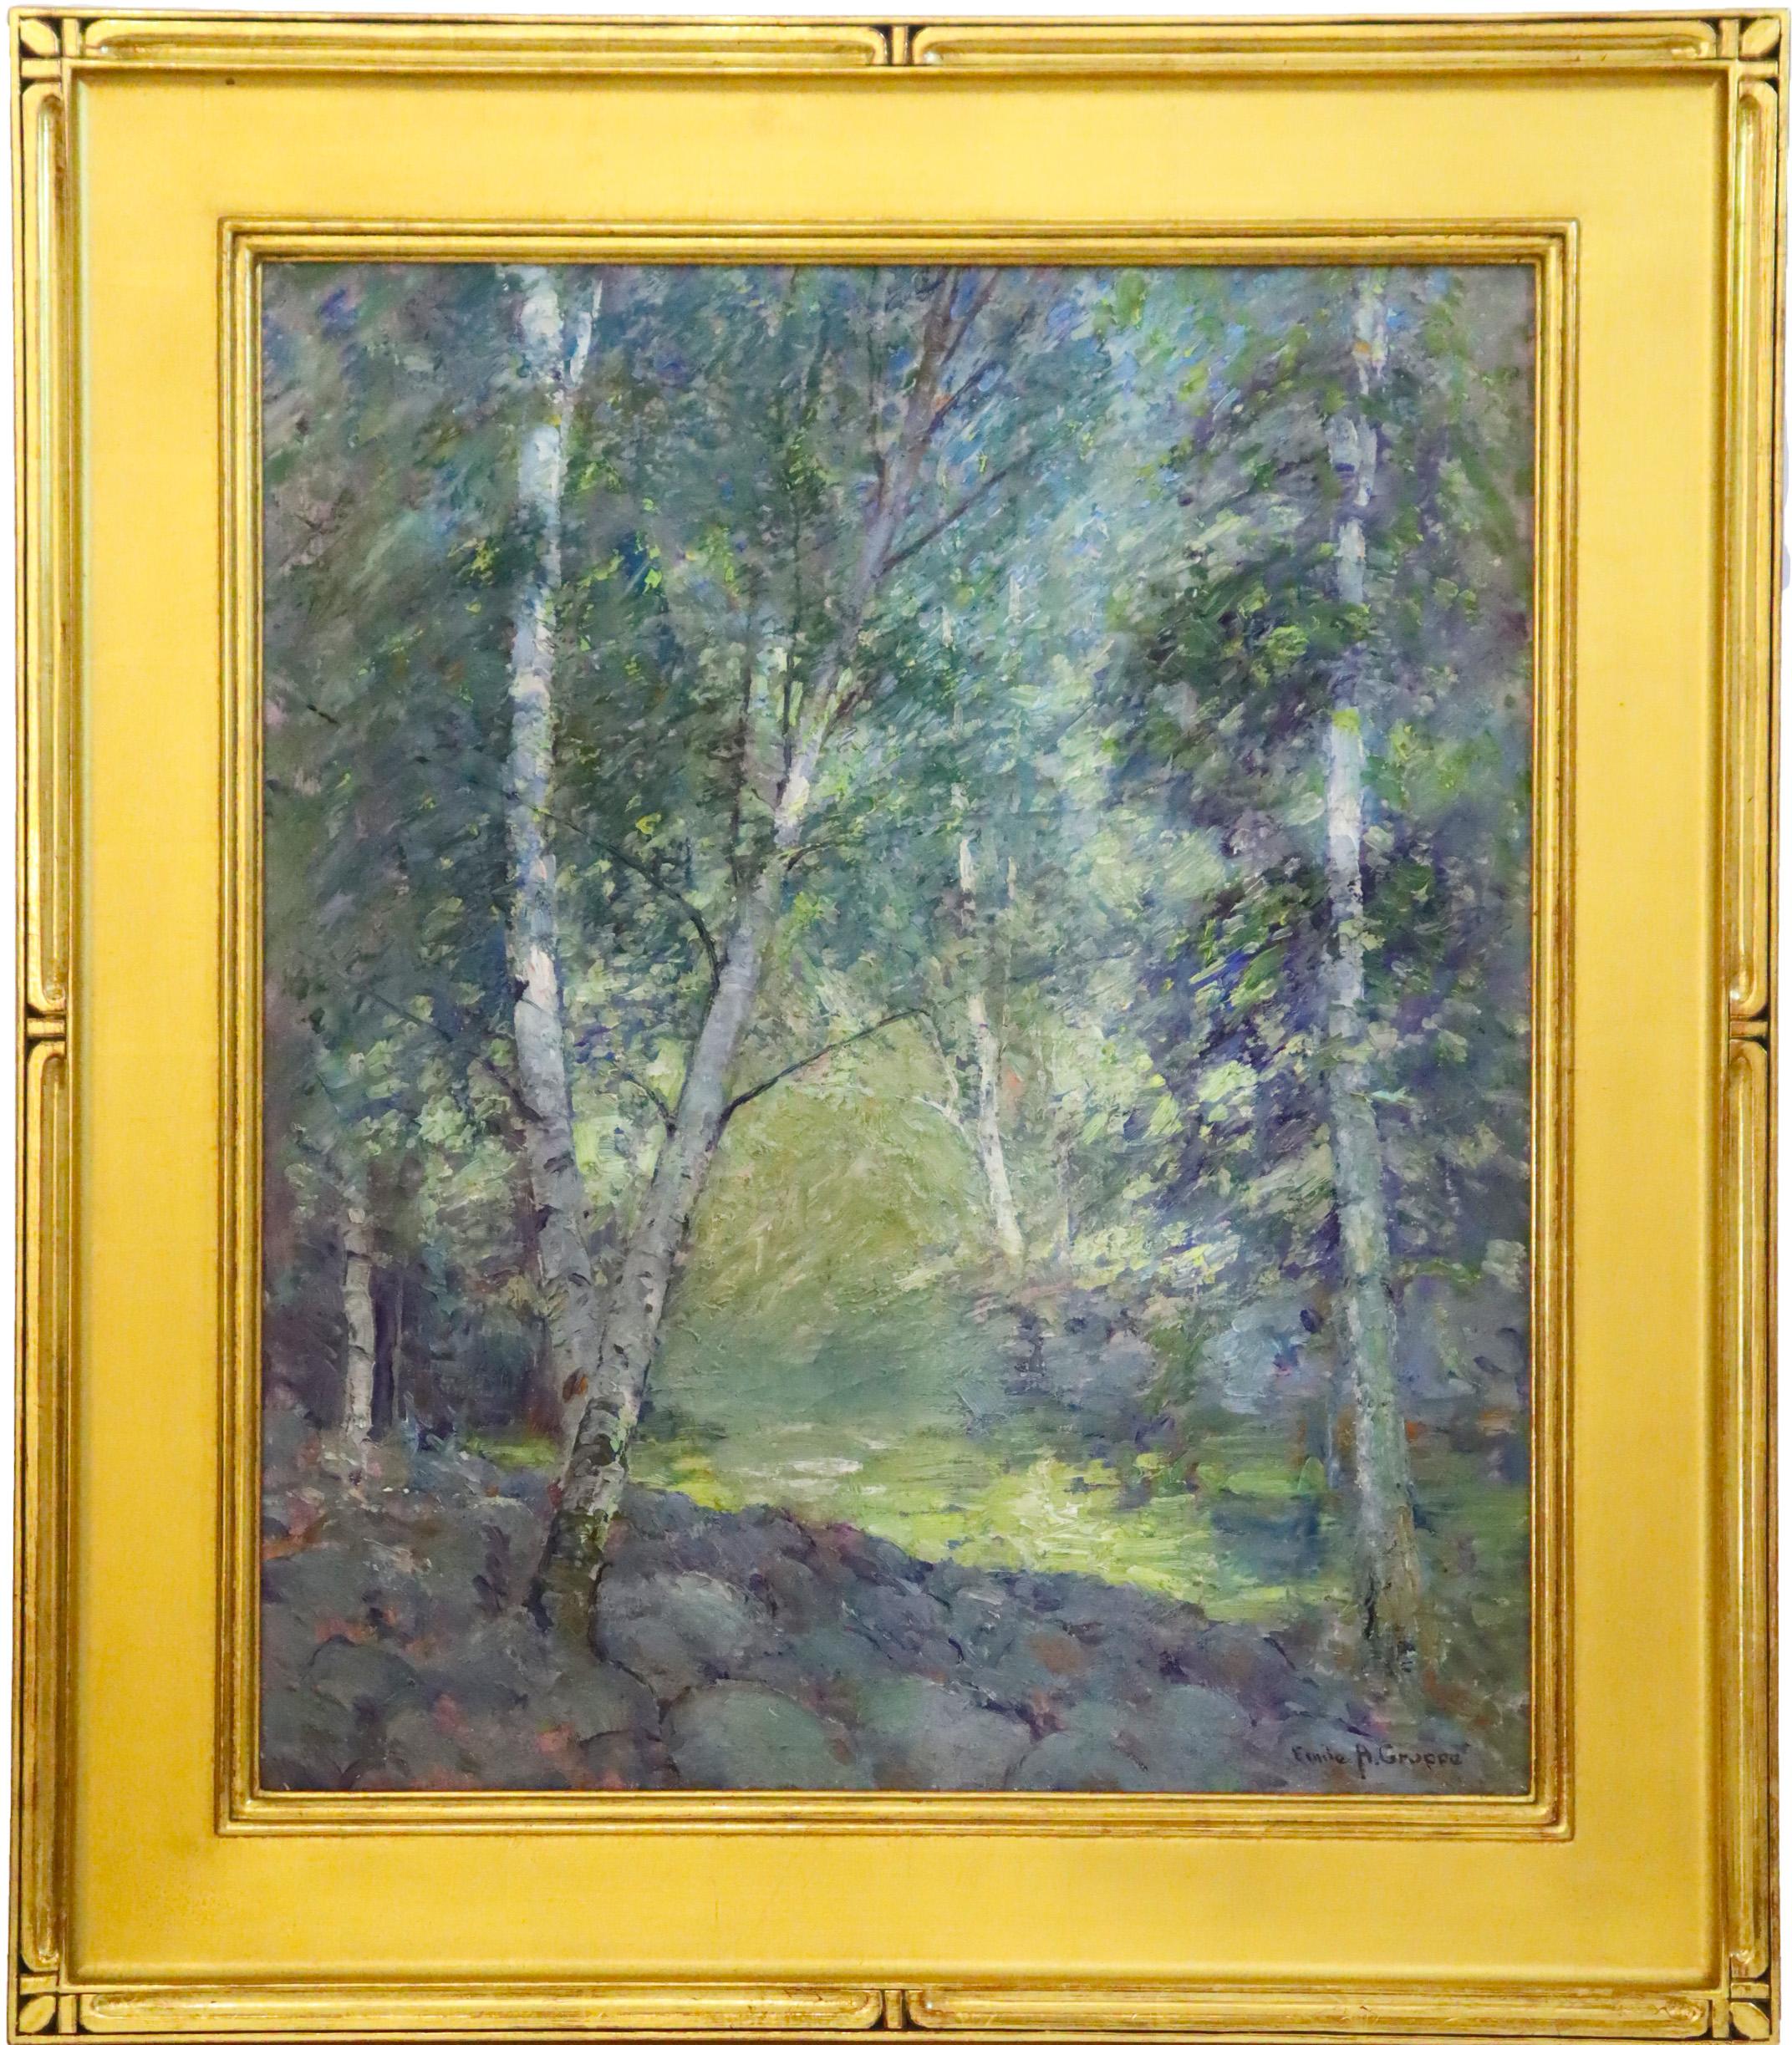 Emile Albert Gruppe (1896-1978) Oil on Canvas